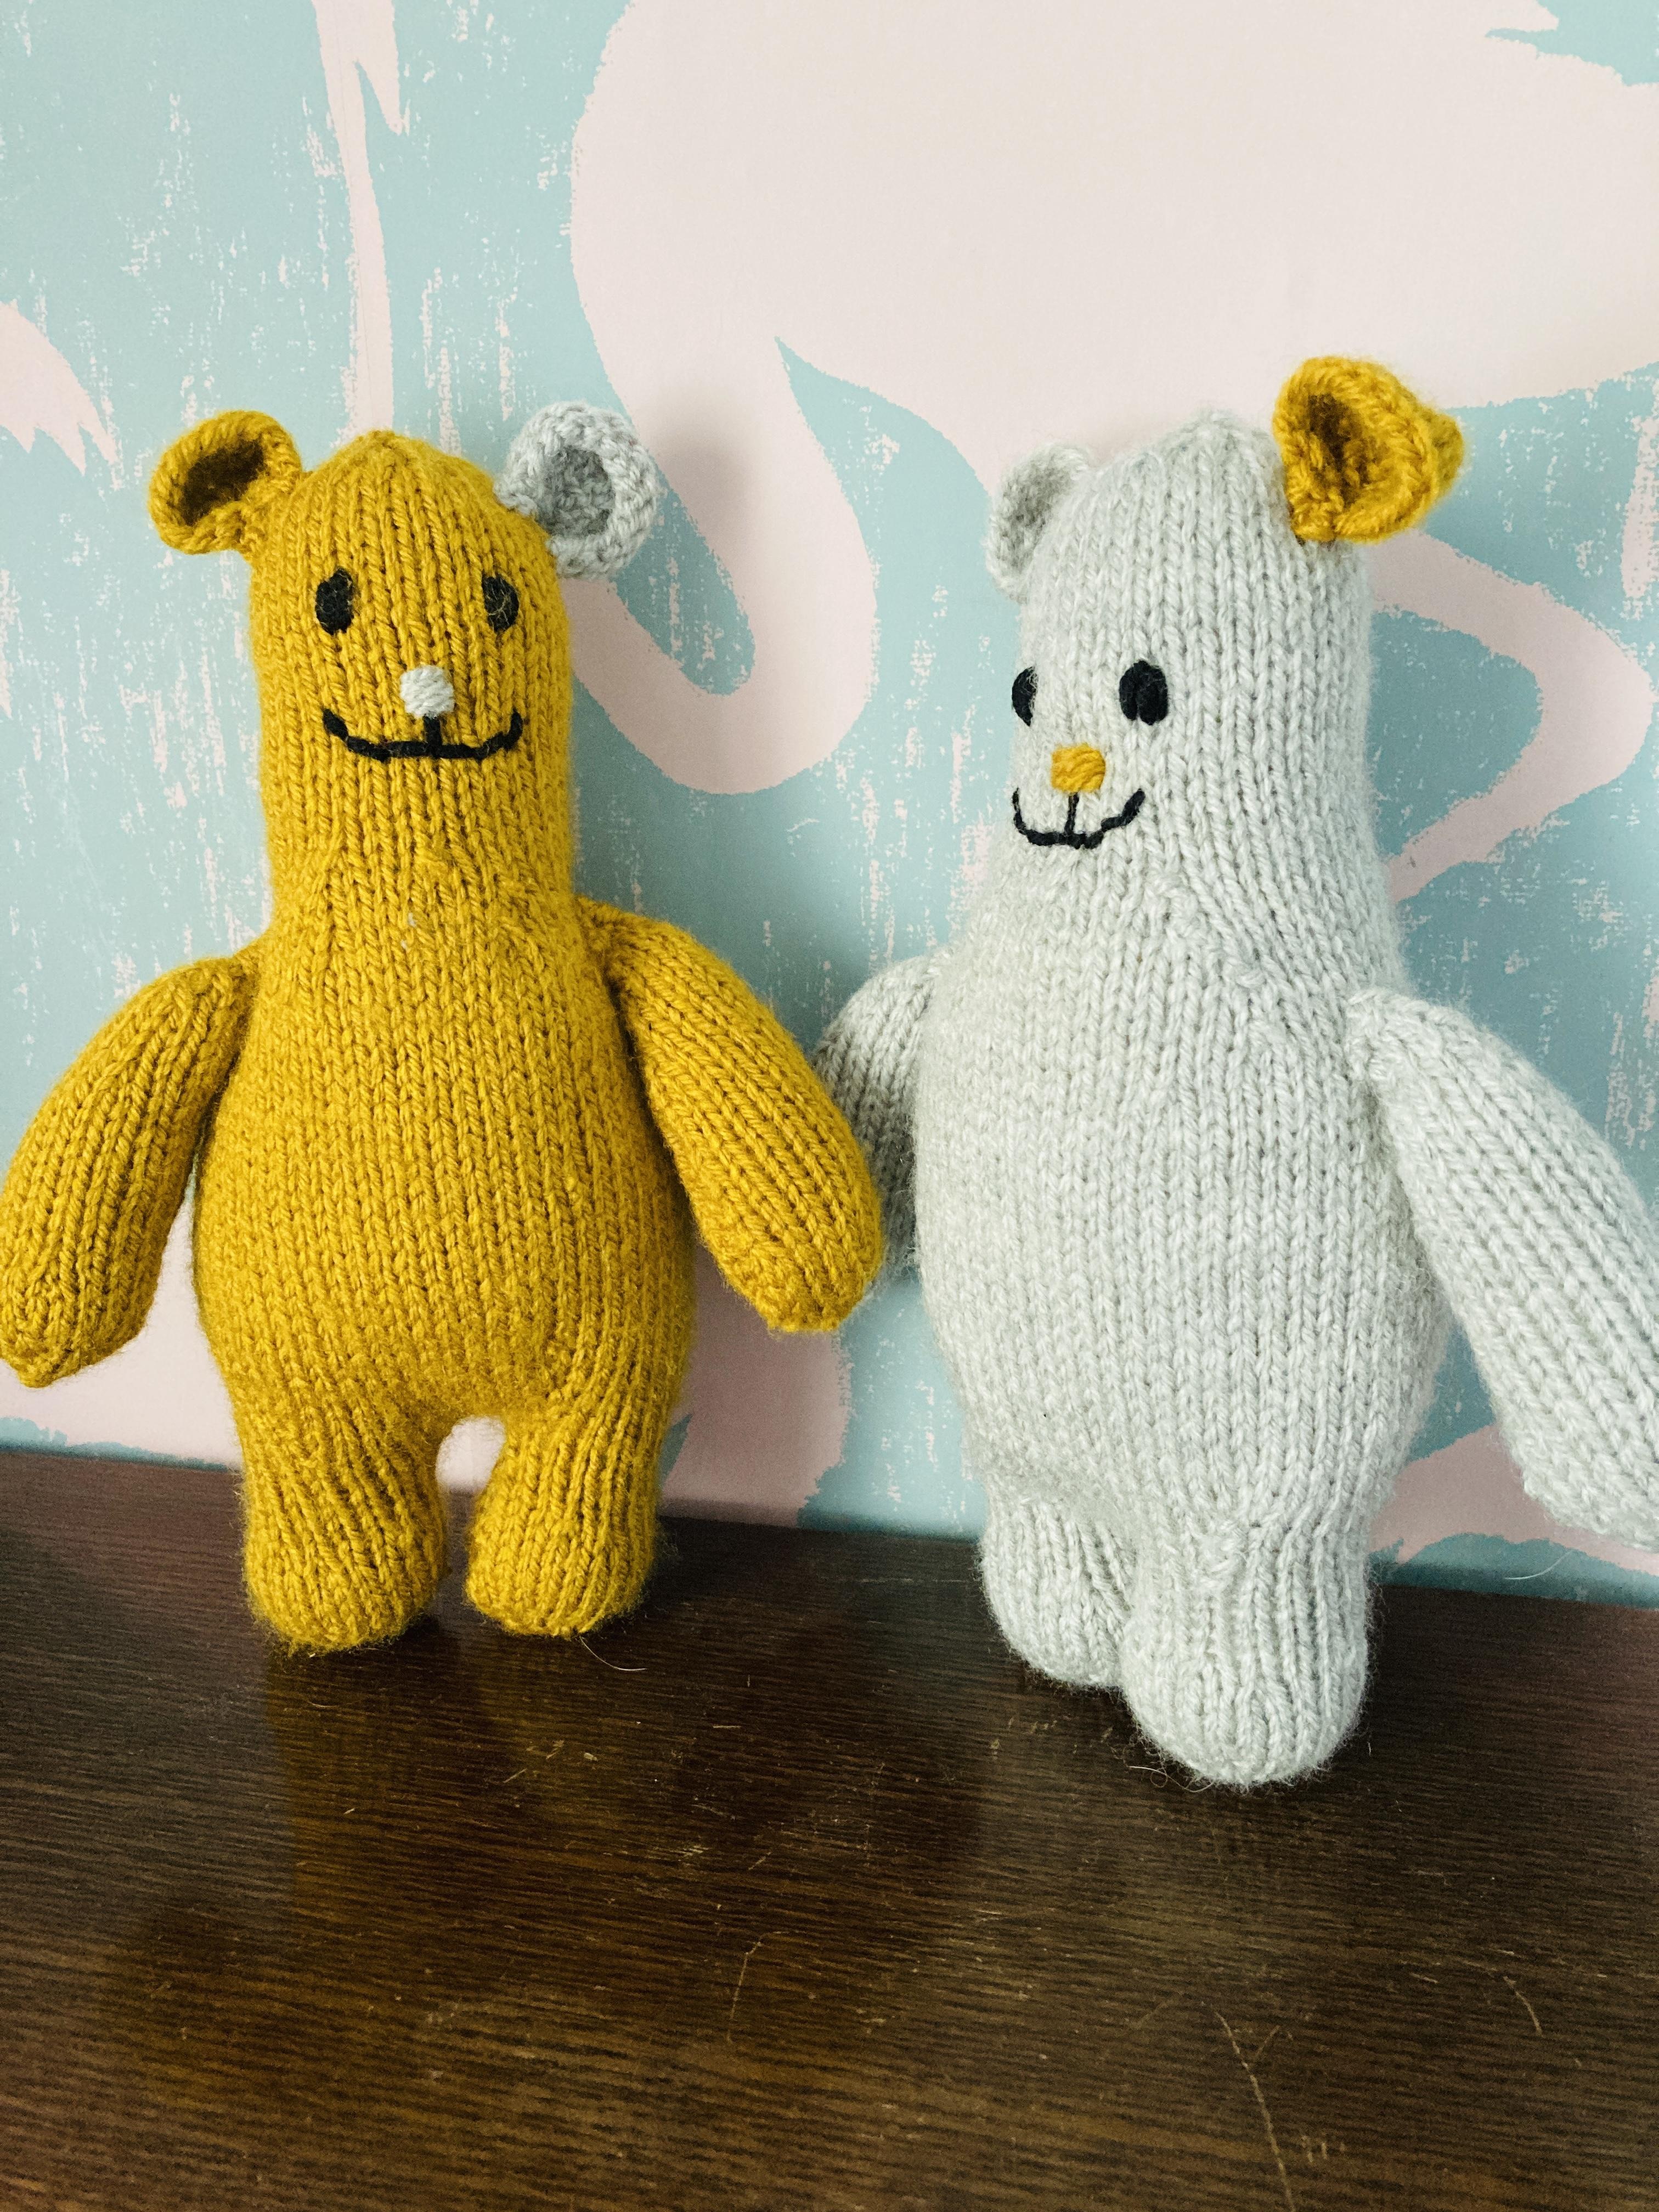 Handmade 'Hygge' Knitted Teddies 00090